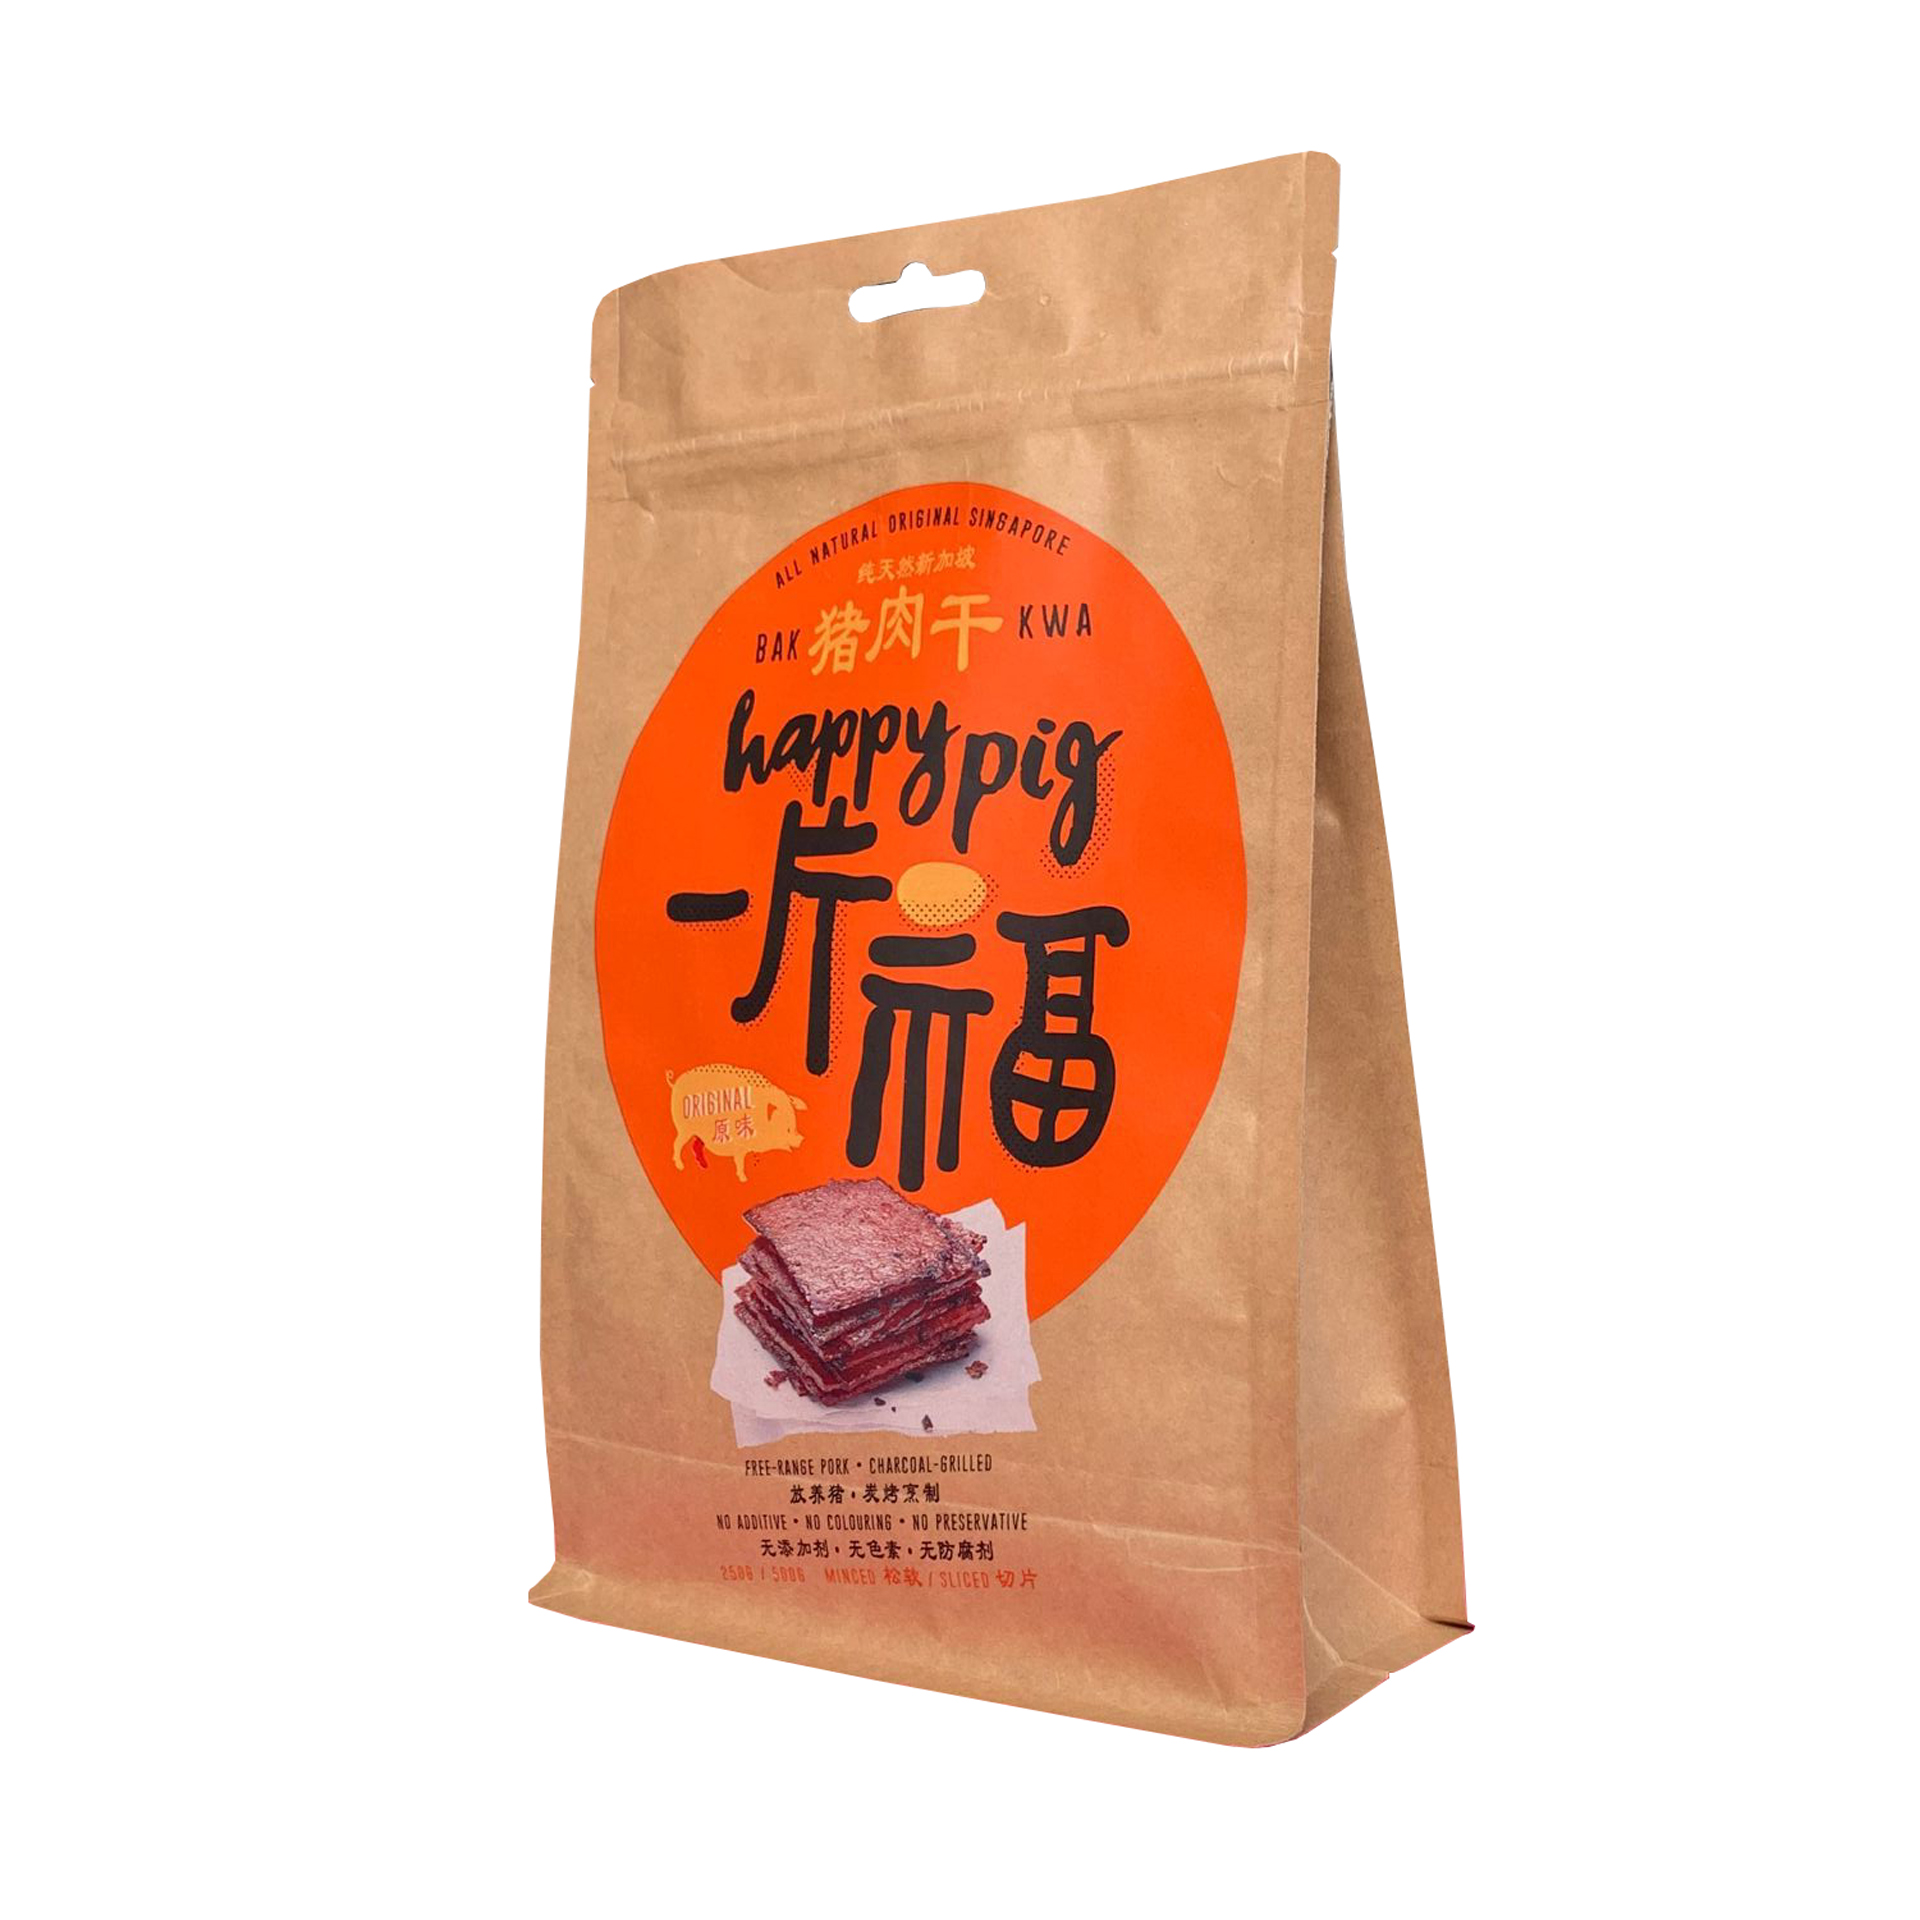 Custom Druck Food Grade Aluminium folie paket Bunte Gedruckt Aluminium Folie Beutel Gedruckt Leere Tee Taschen Großhandel